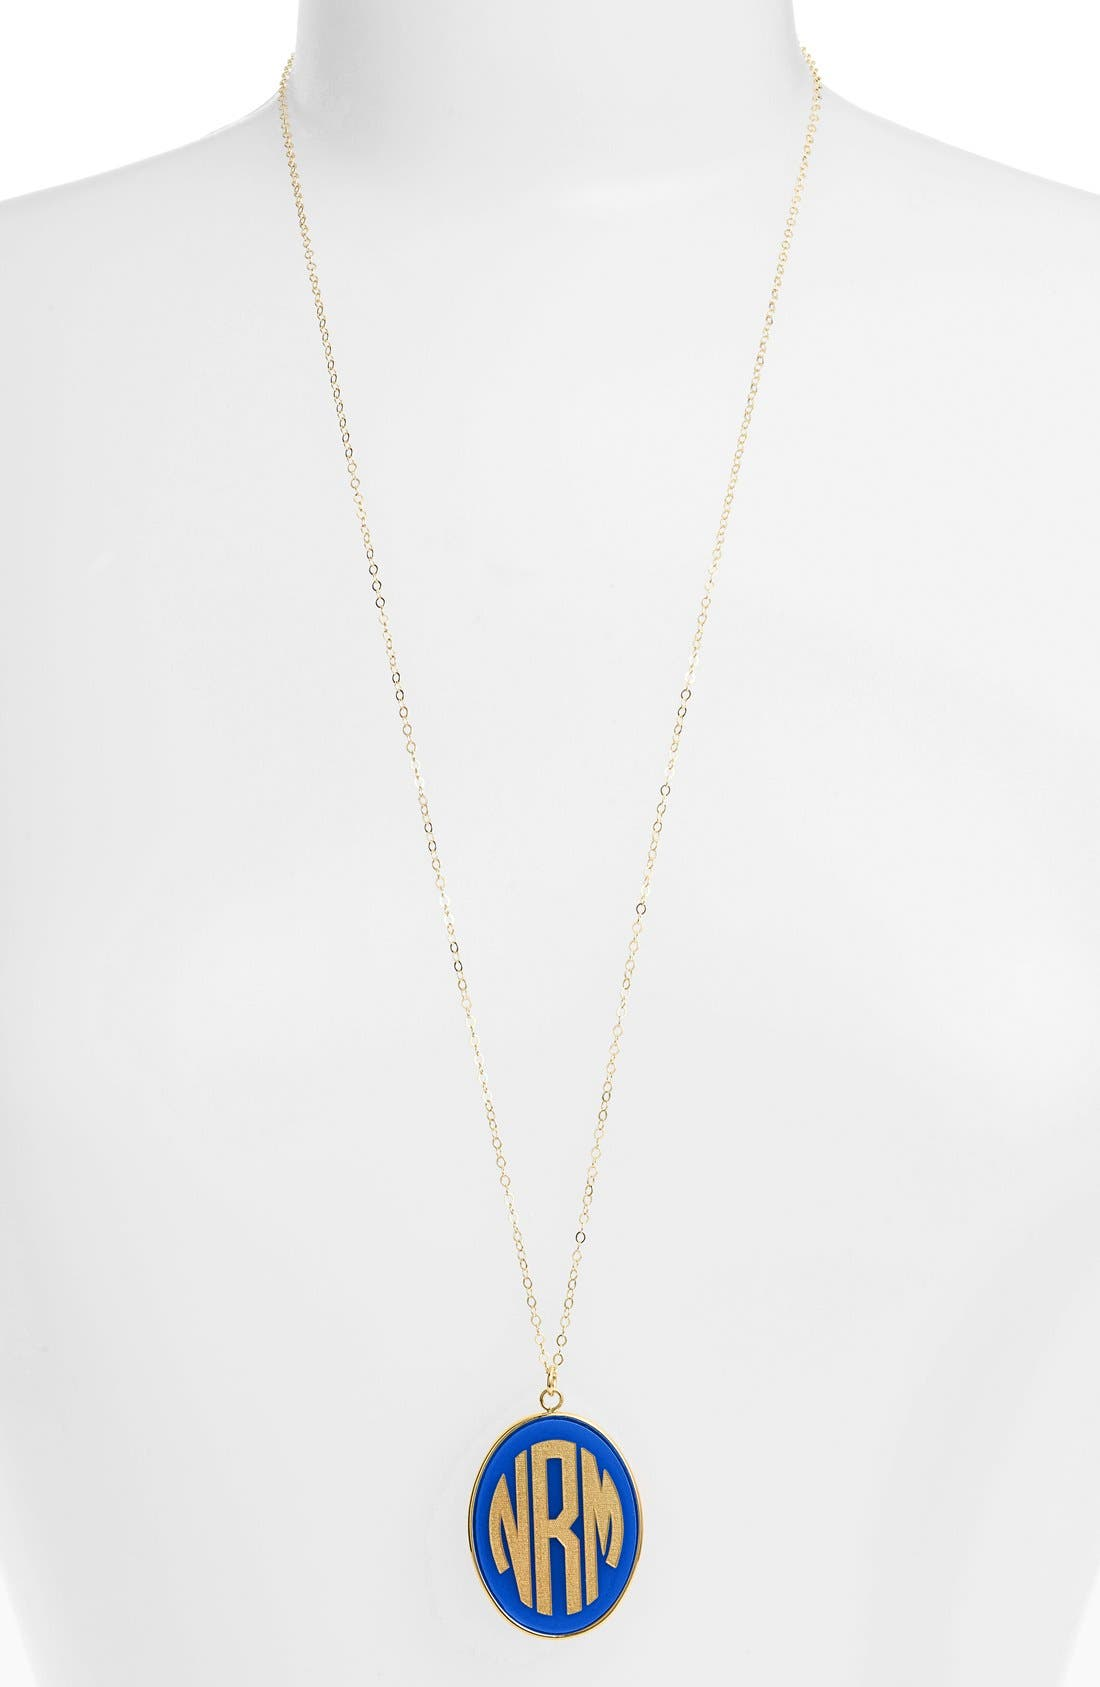 'Vineyard' Personalized Monogram Oval Pendant Necklace,                             Main thumbnail 1, color,                             COBALT